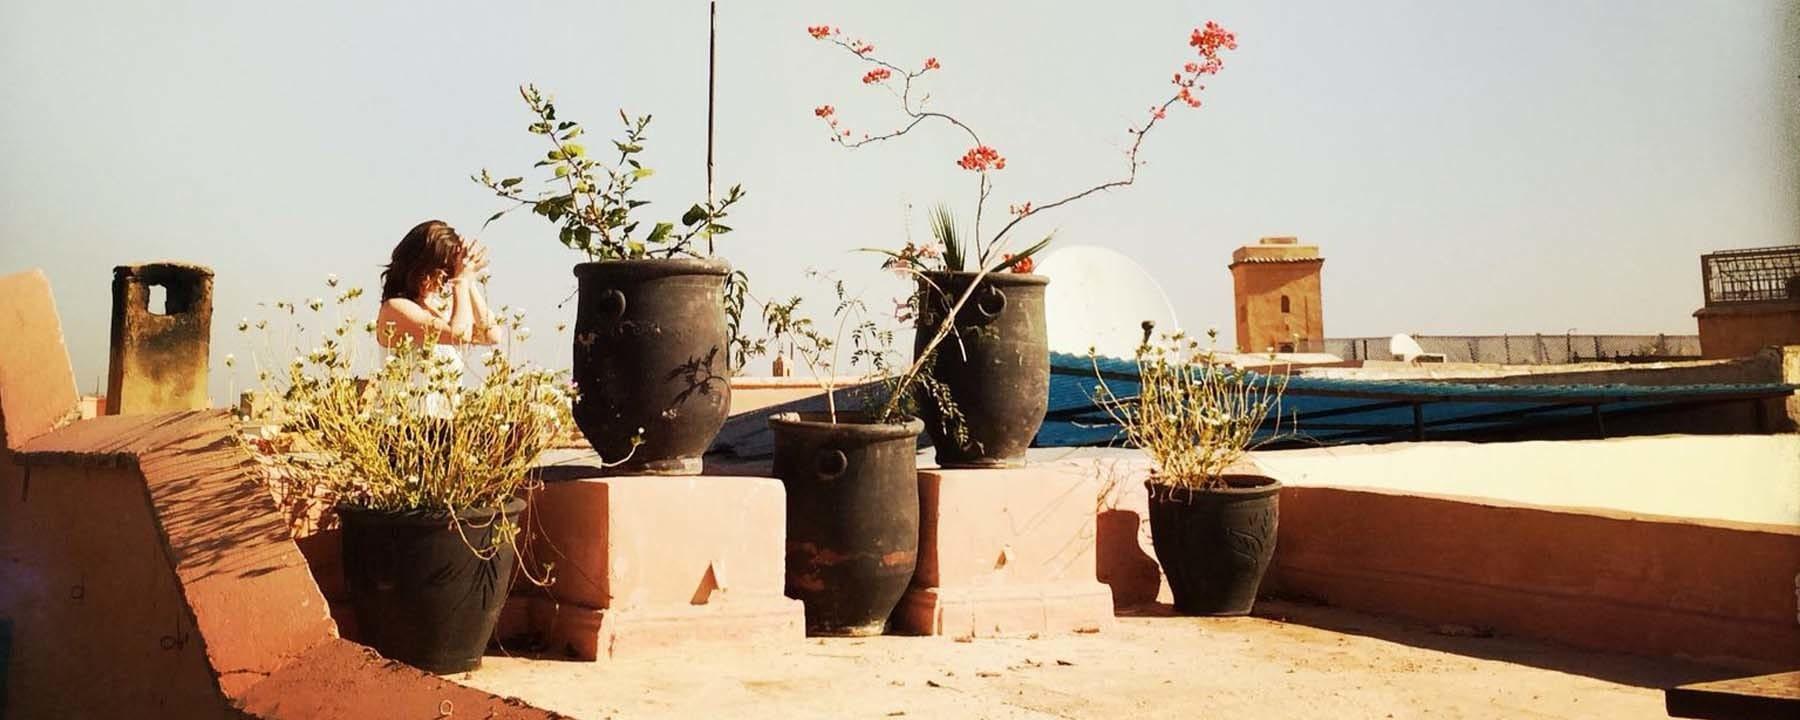 Rooftop Yoga in Marrakech_Source NOSADE